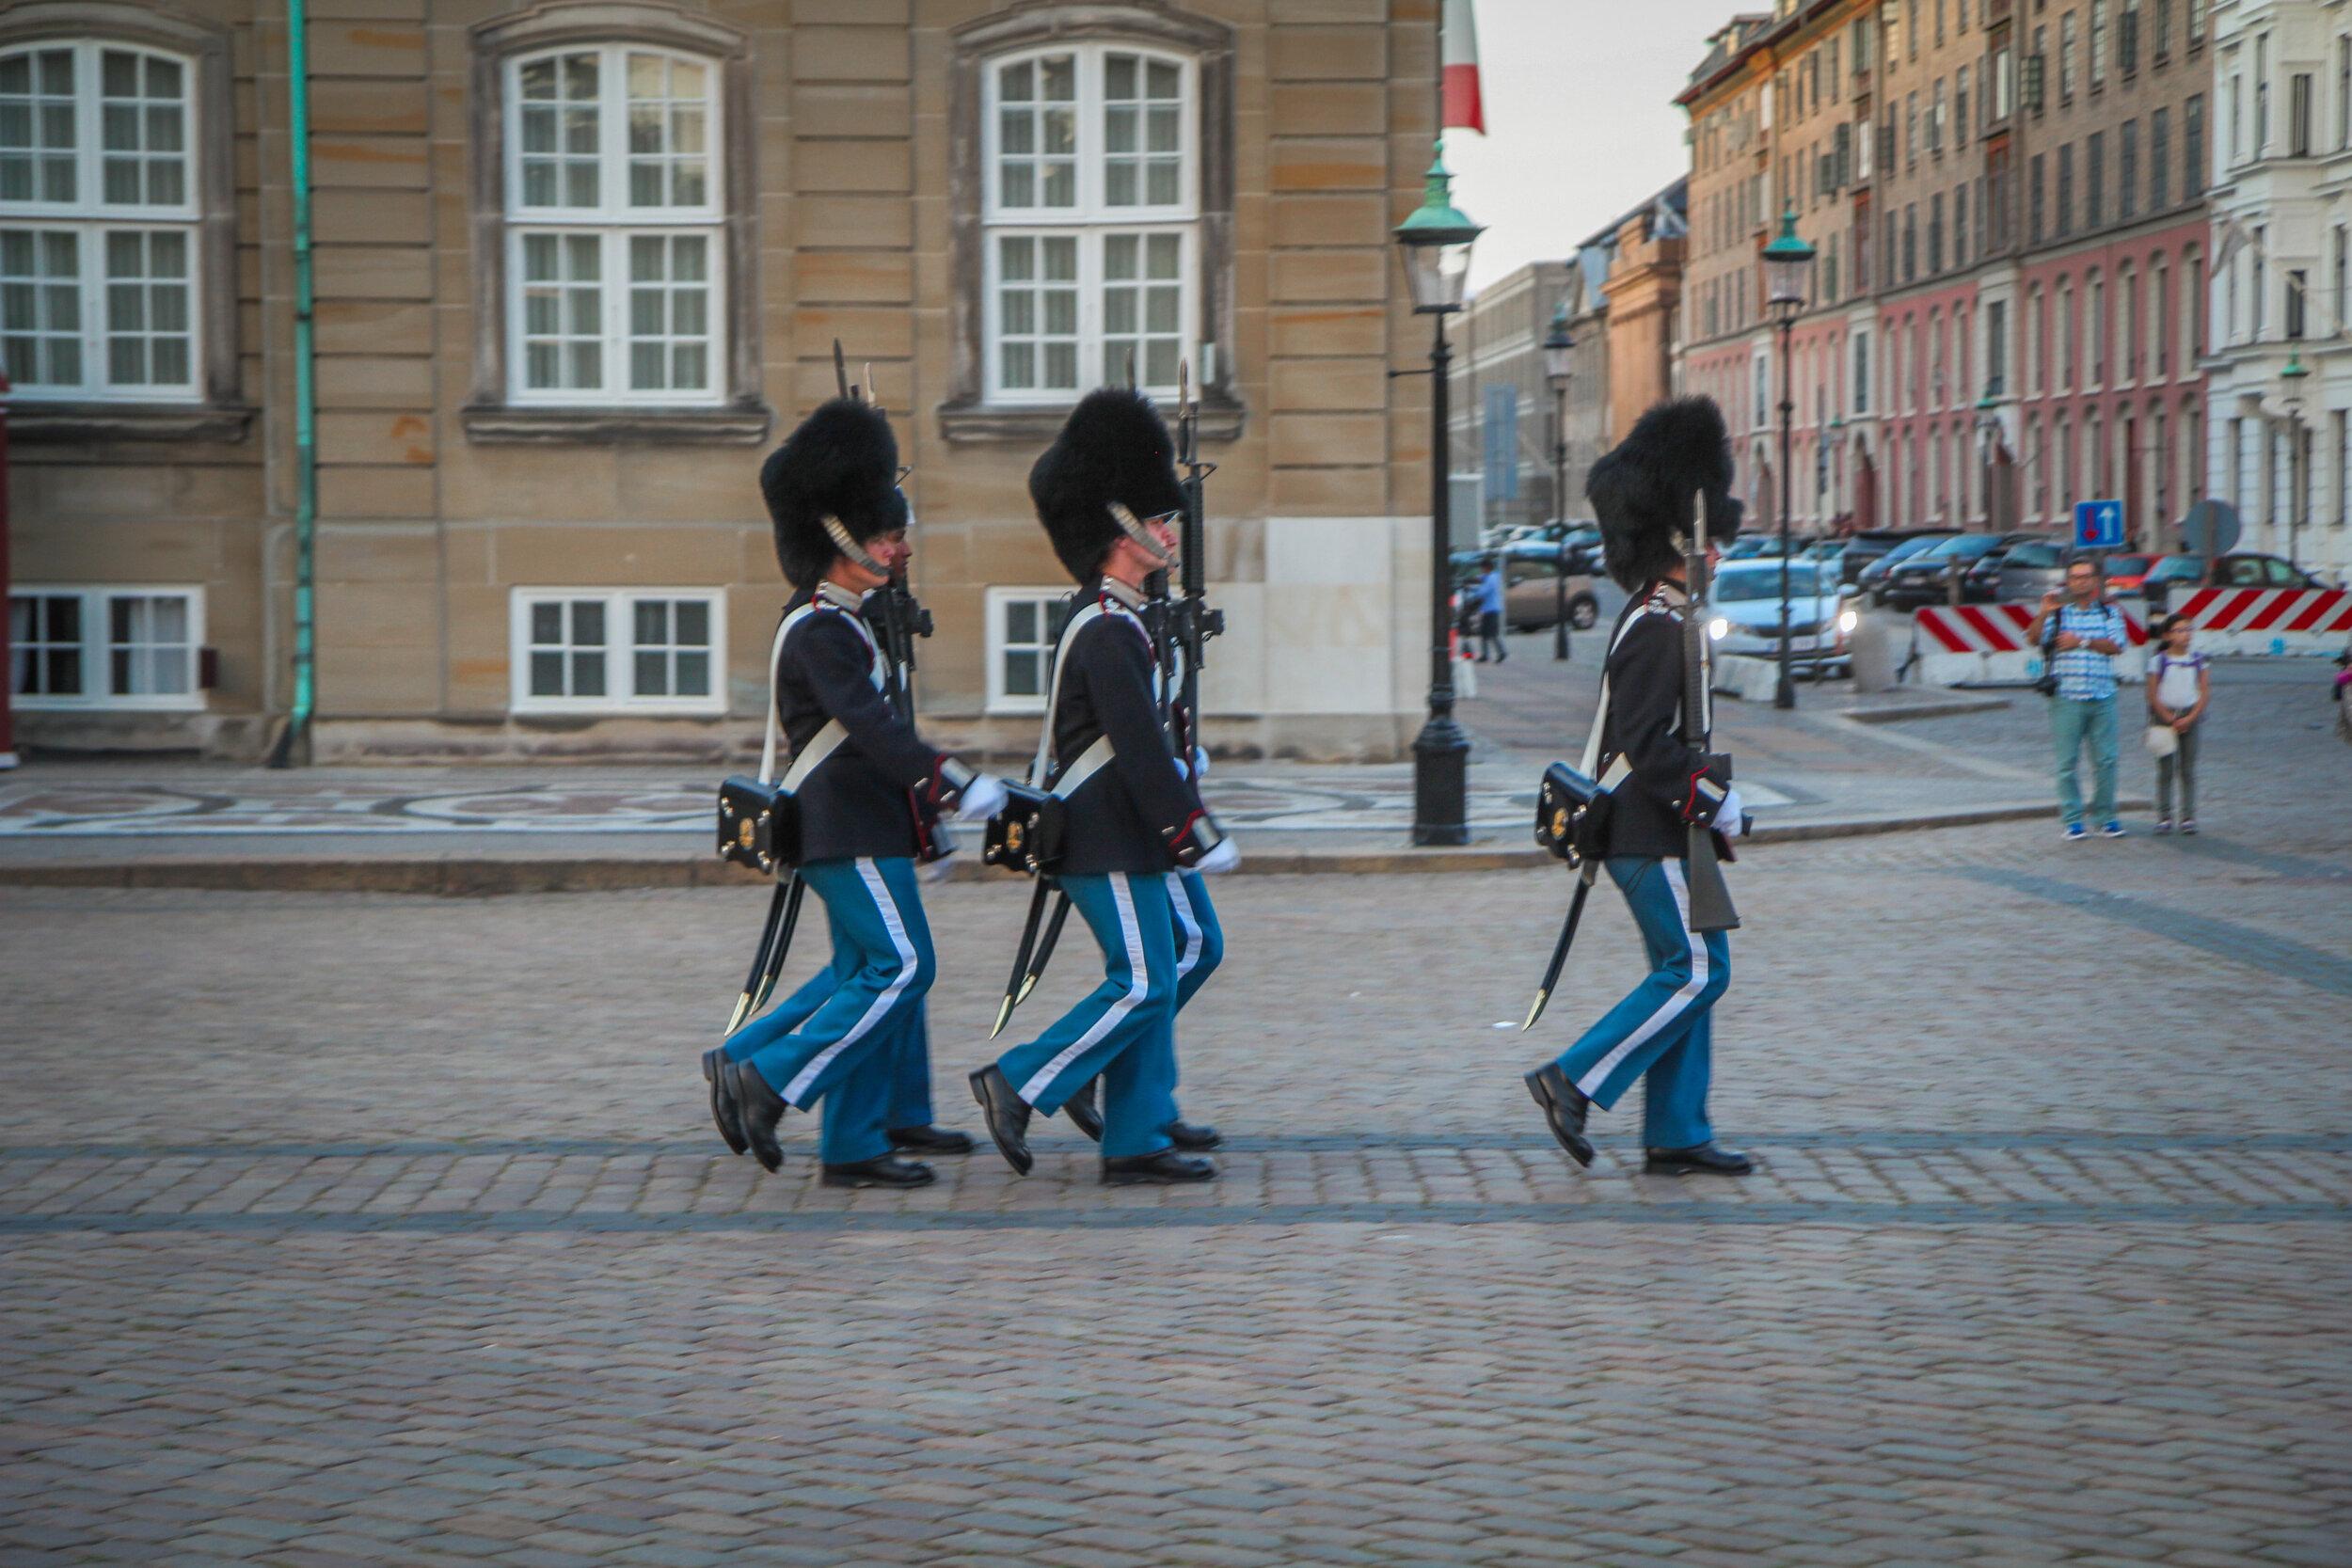 Kopenhagen_denemarken_Tui-122.jpg